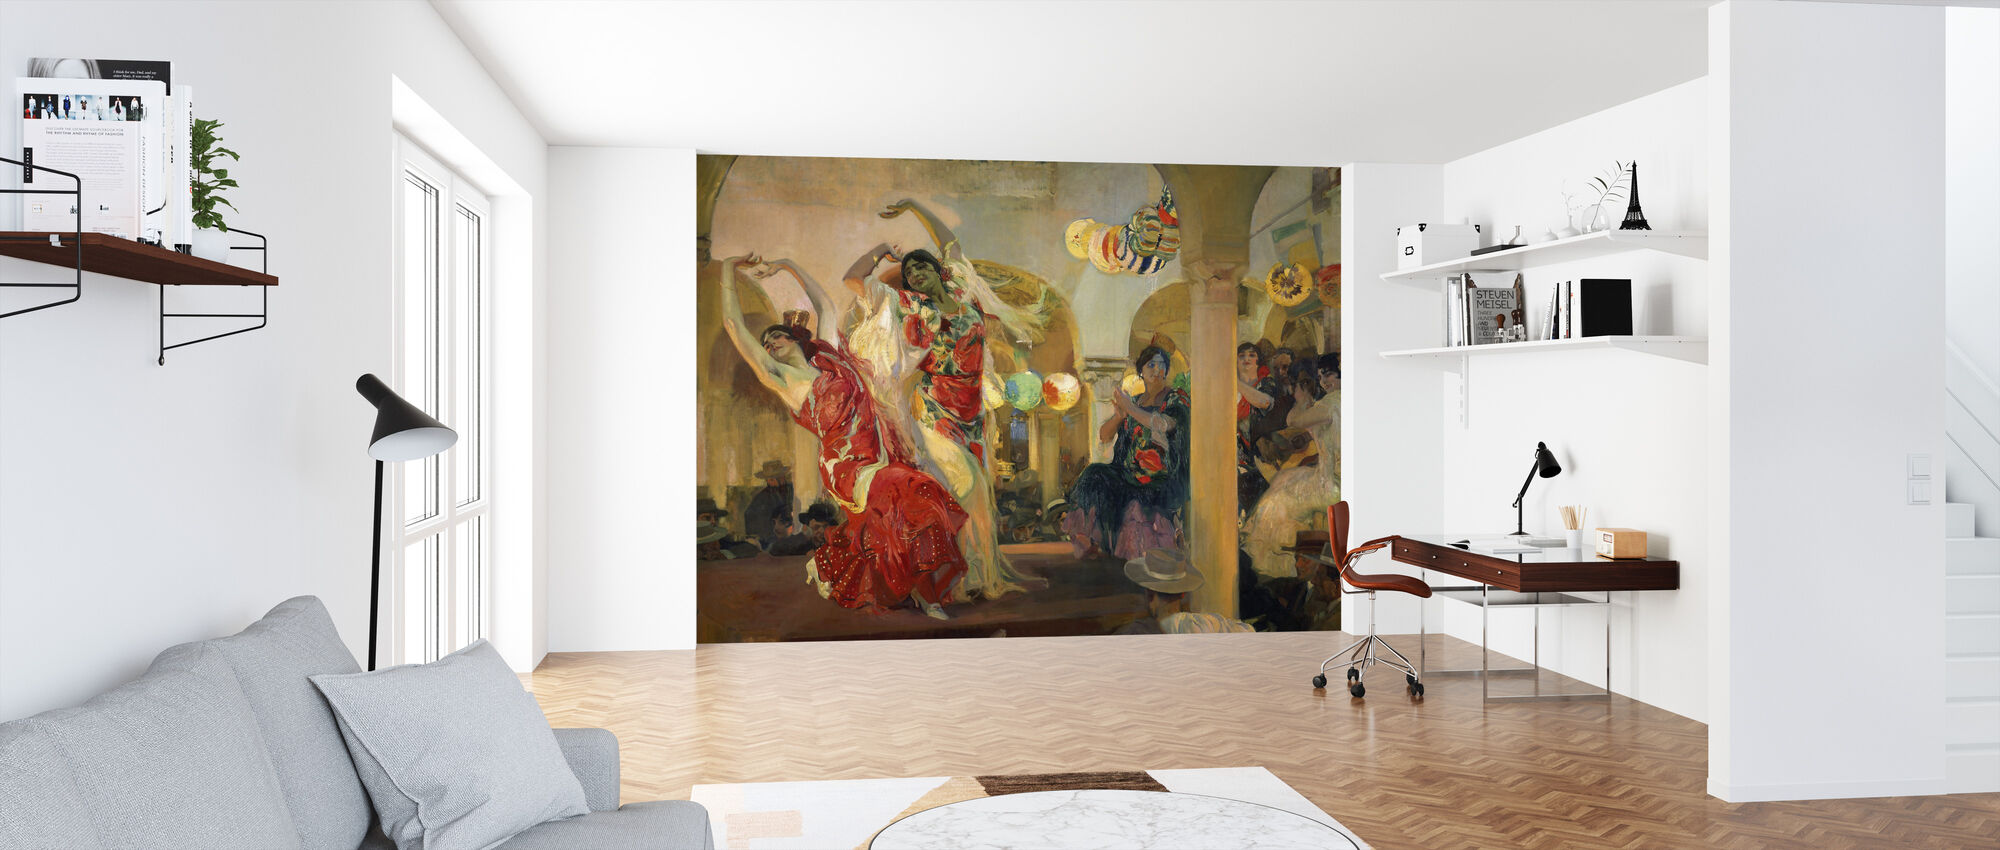 Women Dancing - Joaquin Sorolla - Wallpaper - Office